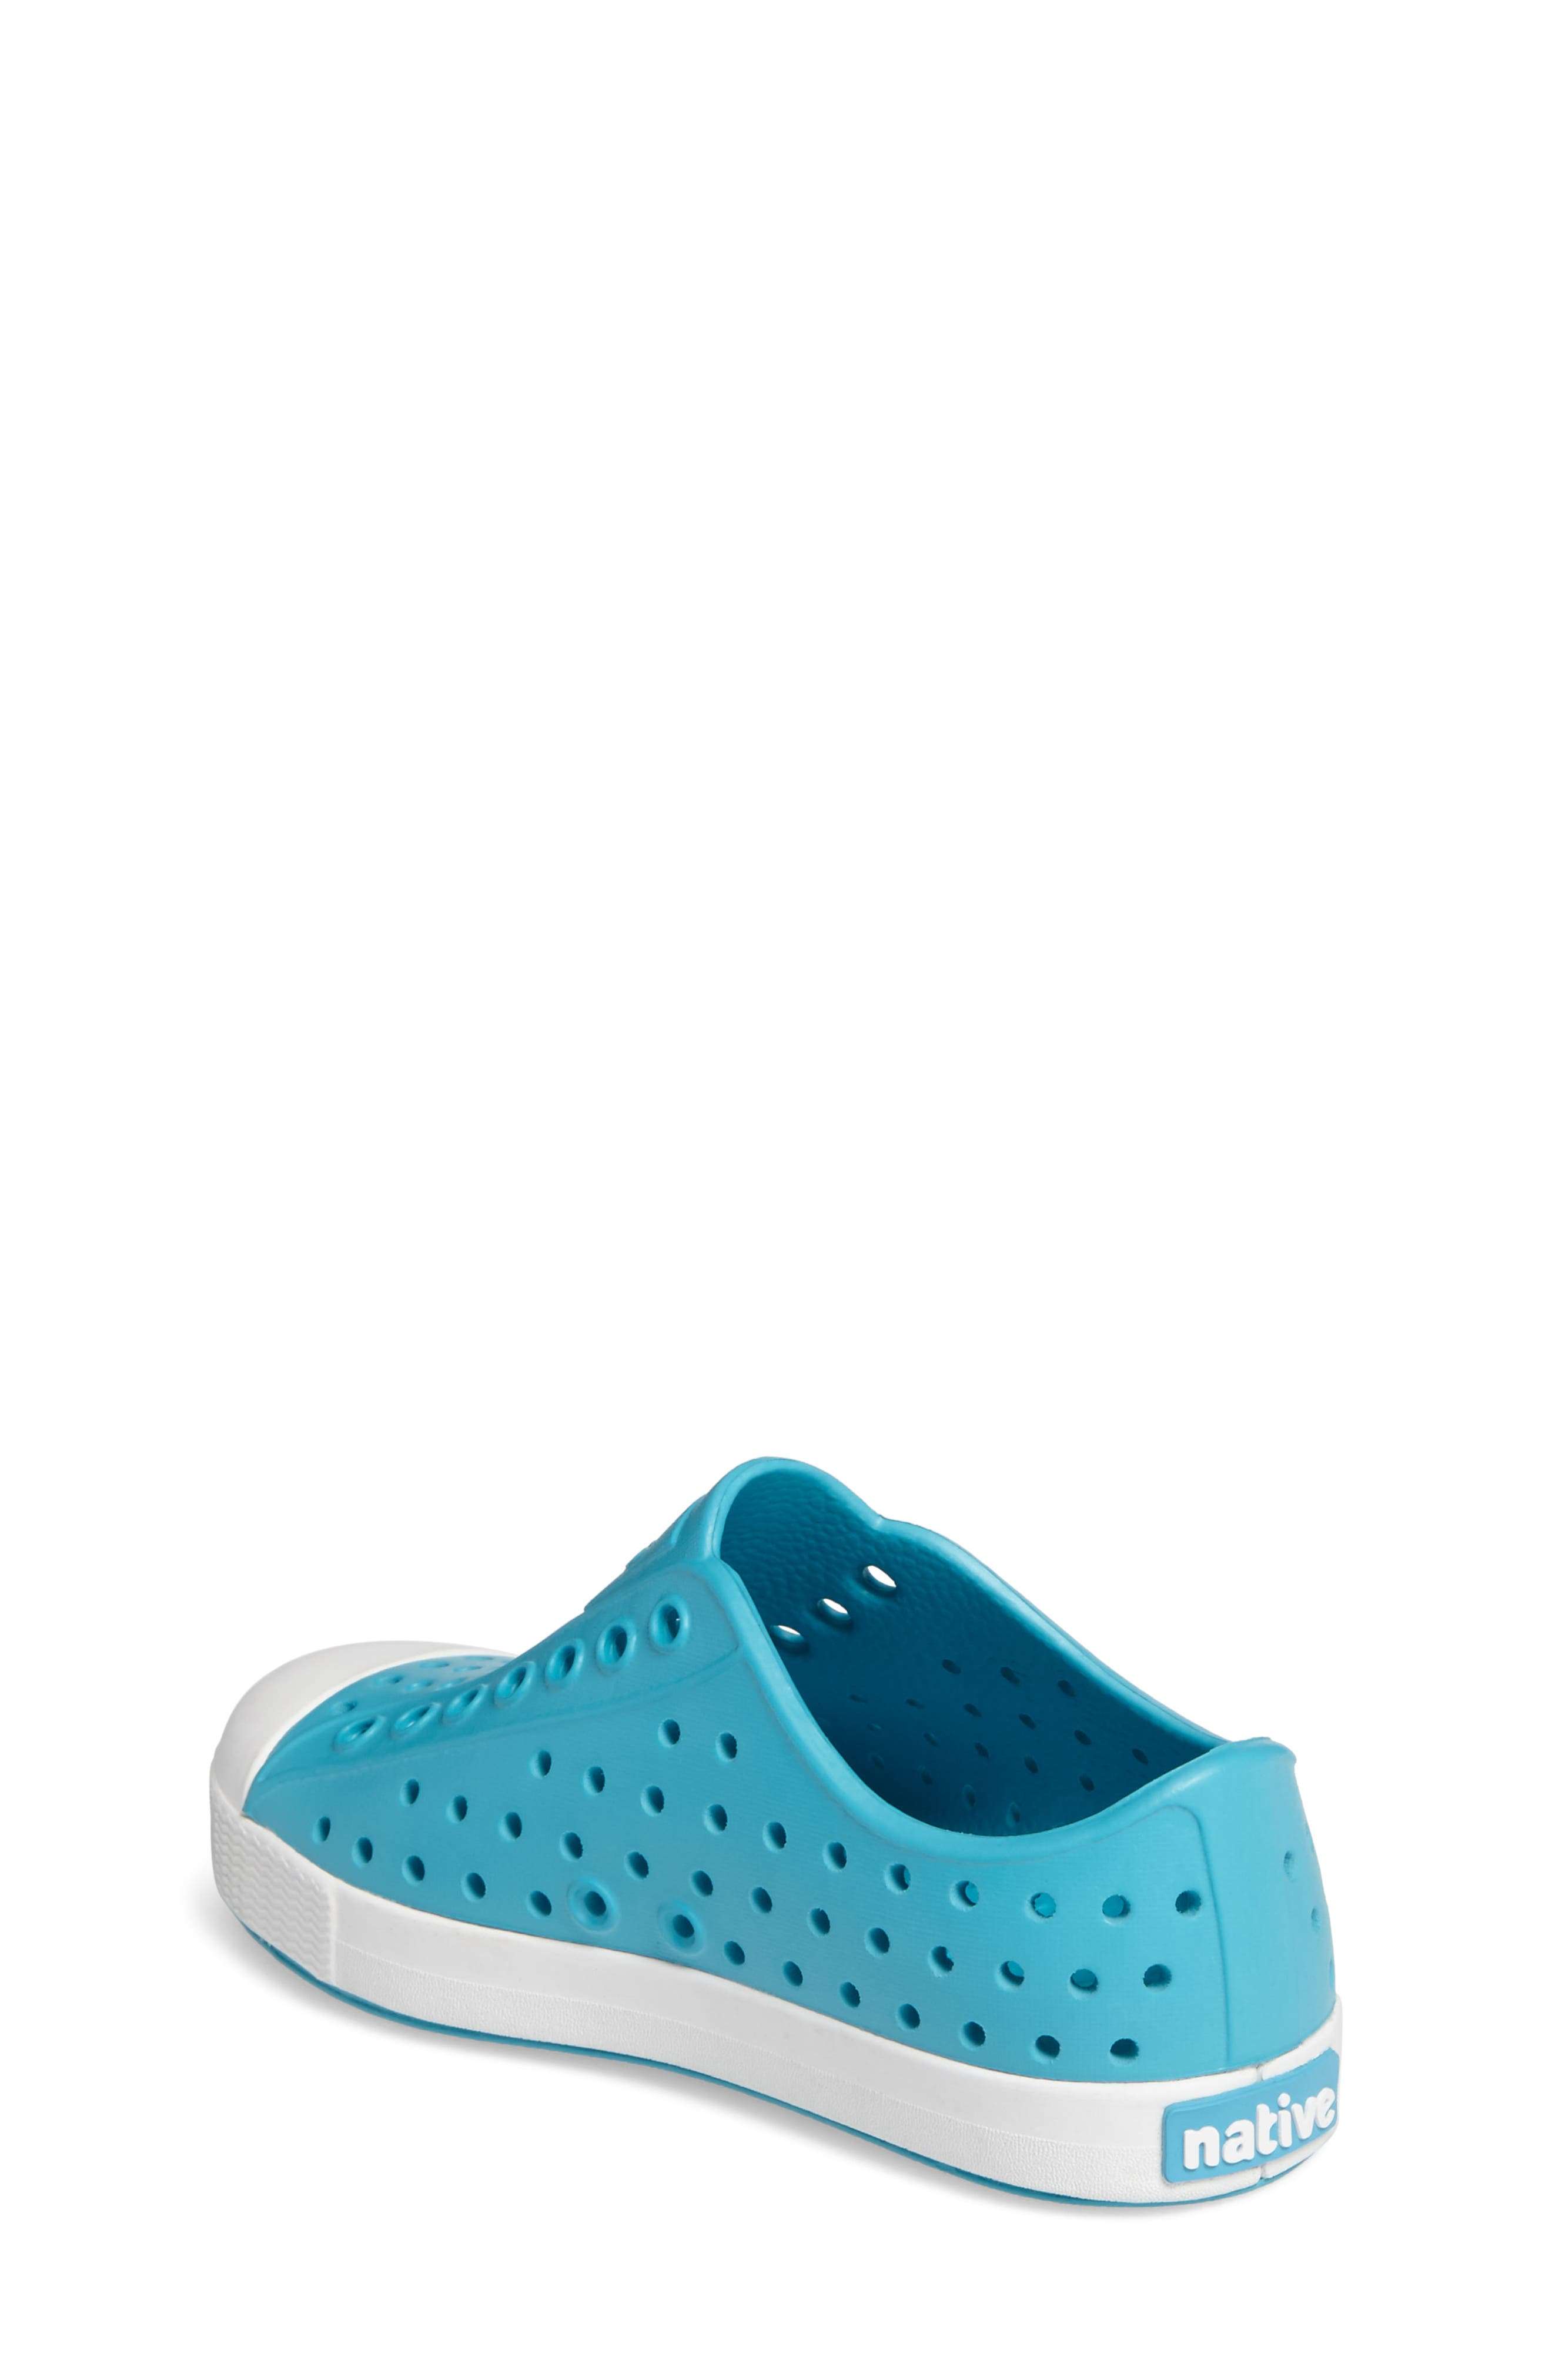 'Jefferson' Water Friendly Slip-On Sneaker,                             Alternate thumbnail 98, color,